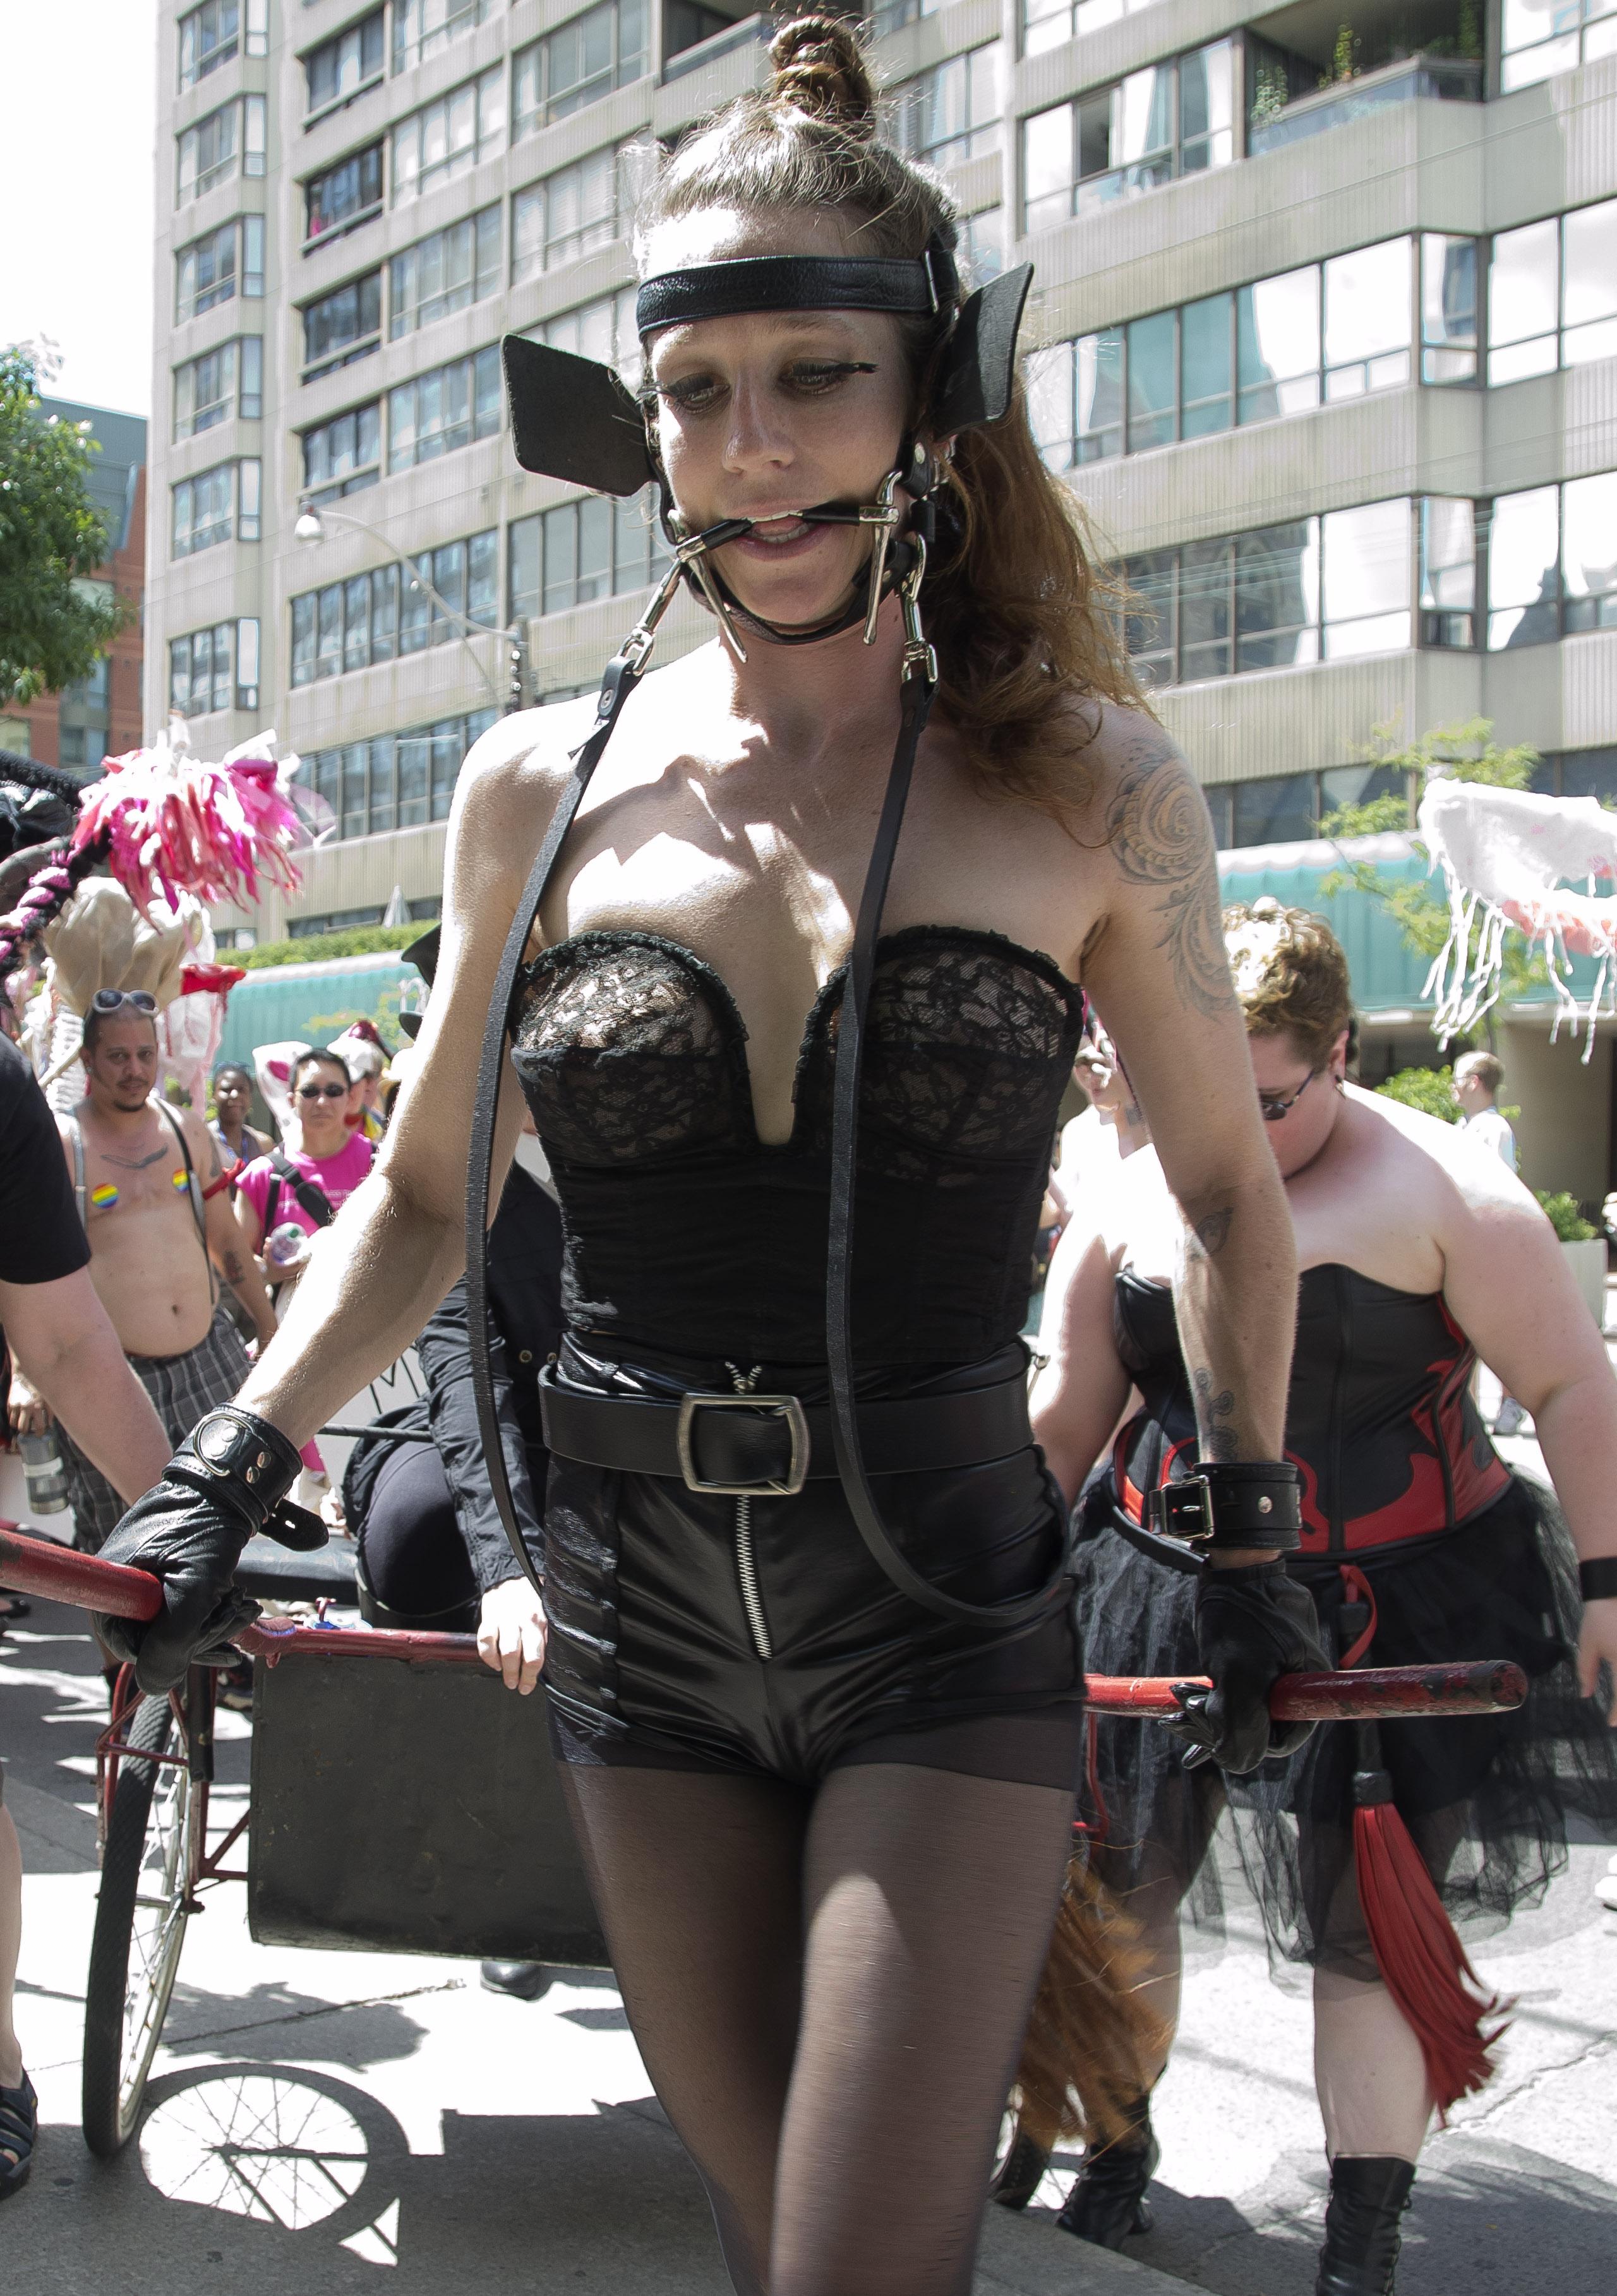 bodypaint vagina